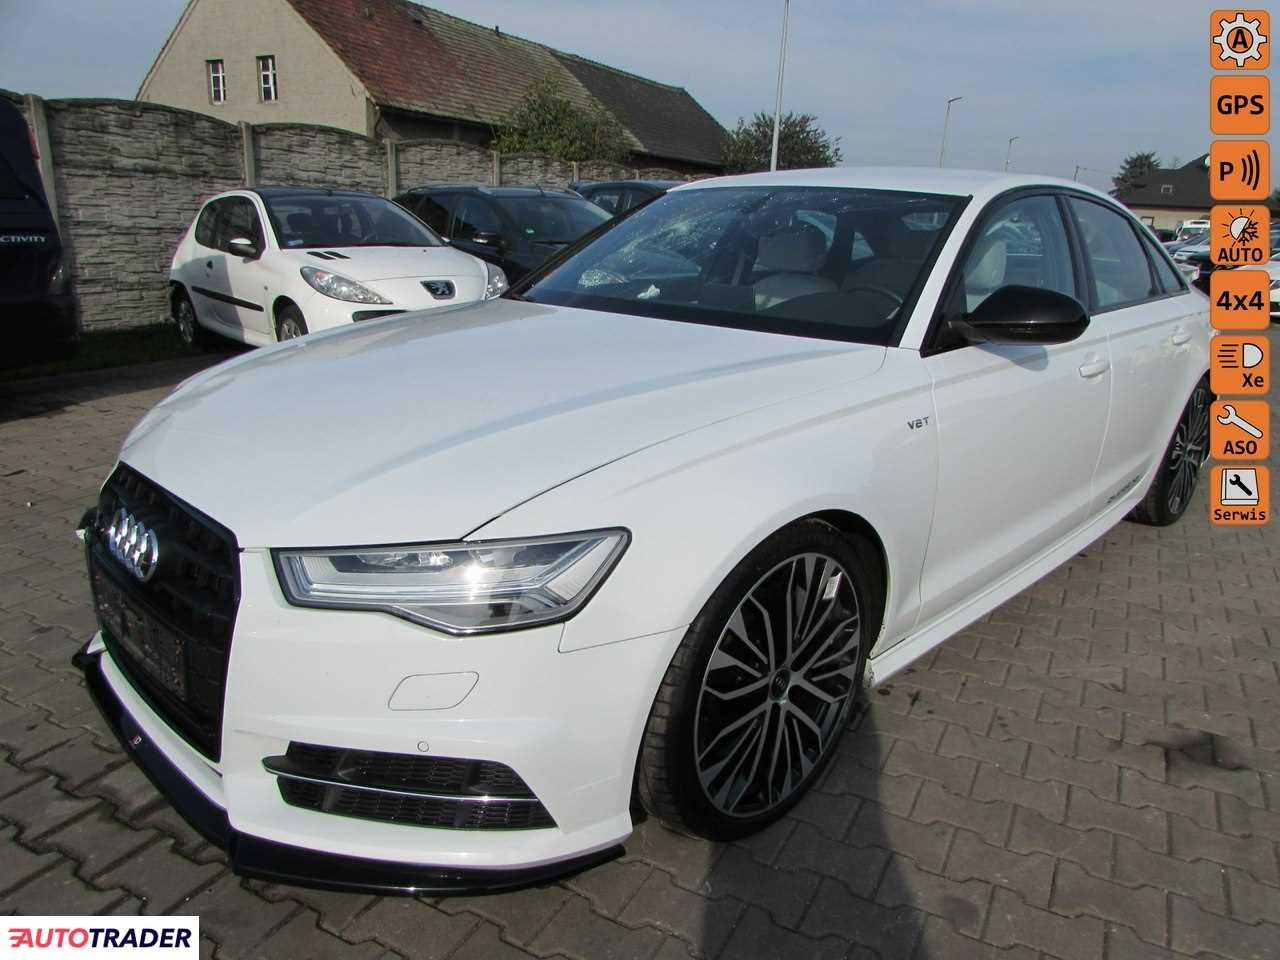 Audi A6 2018 3 326 KM